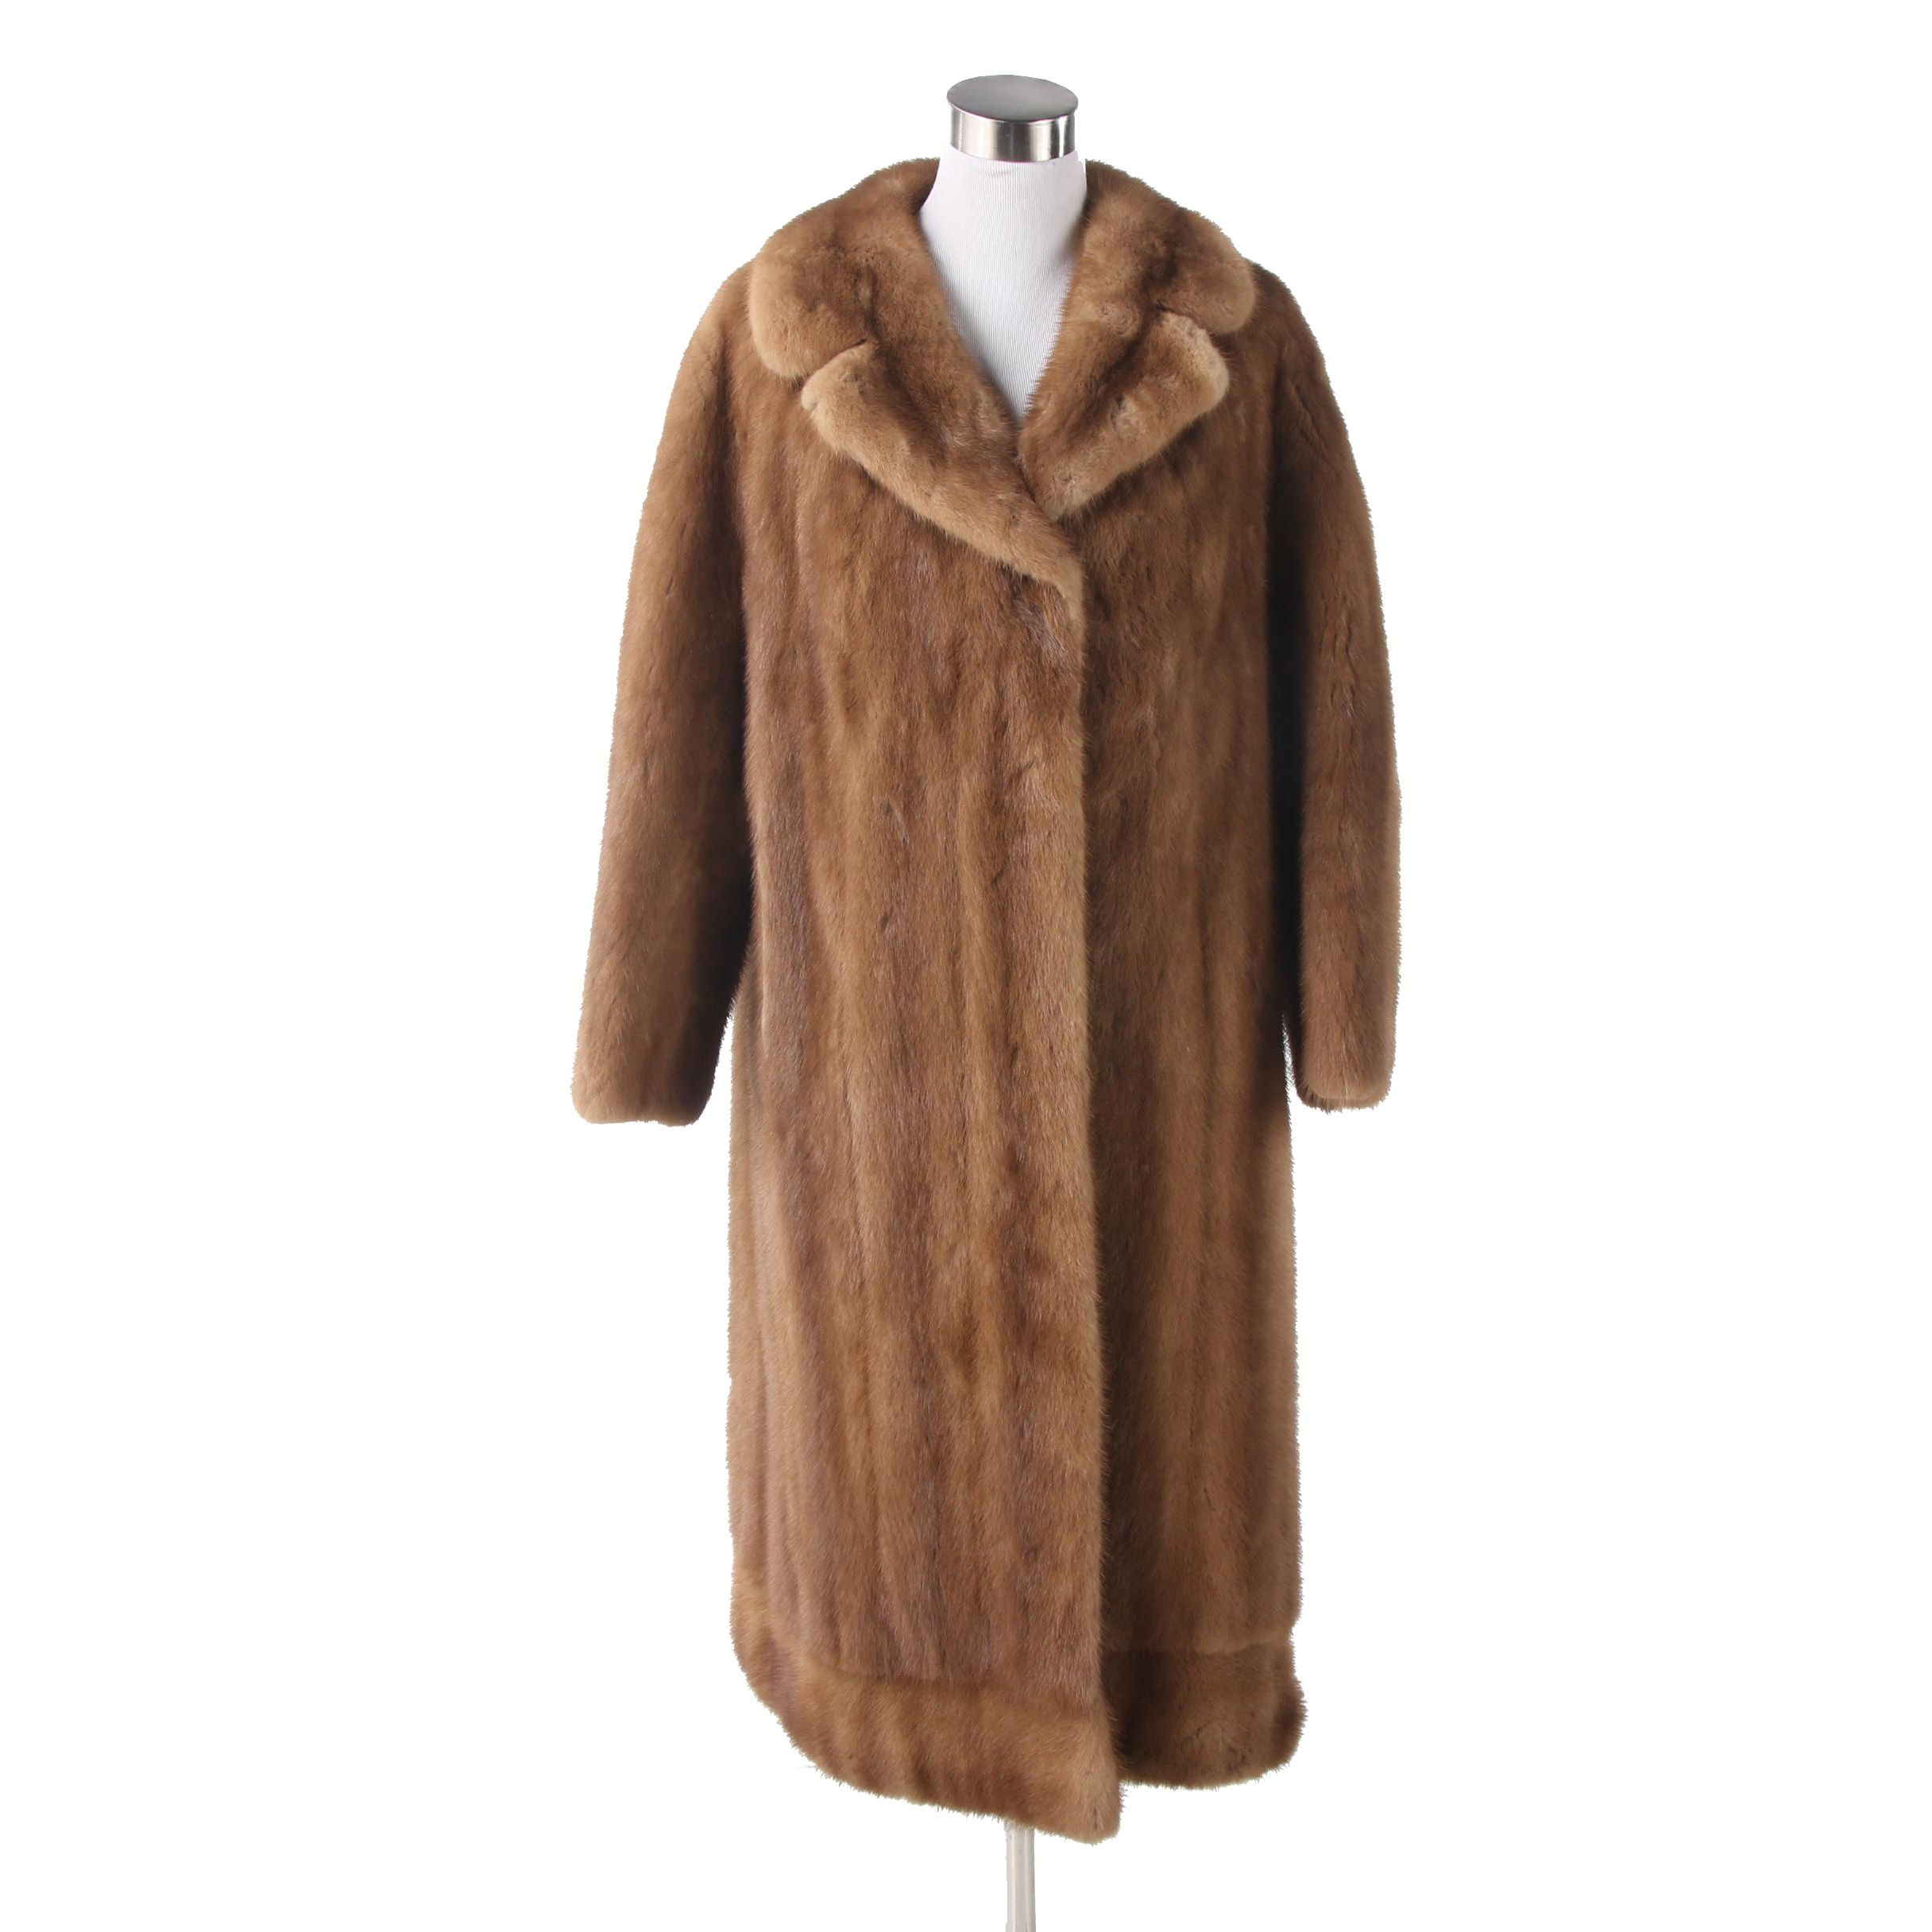 Women's Meister Klasse Tawny Mink Fur Coat, Vintage